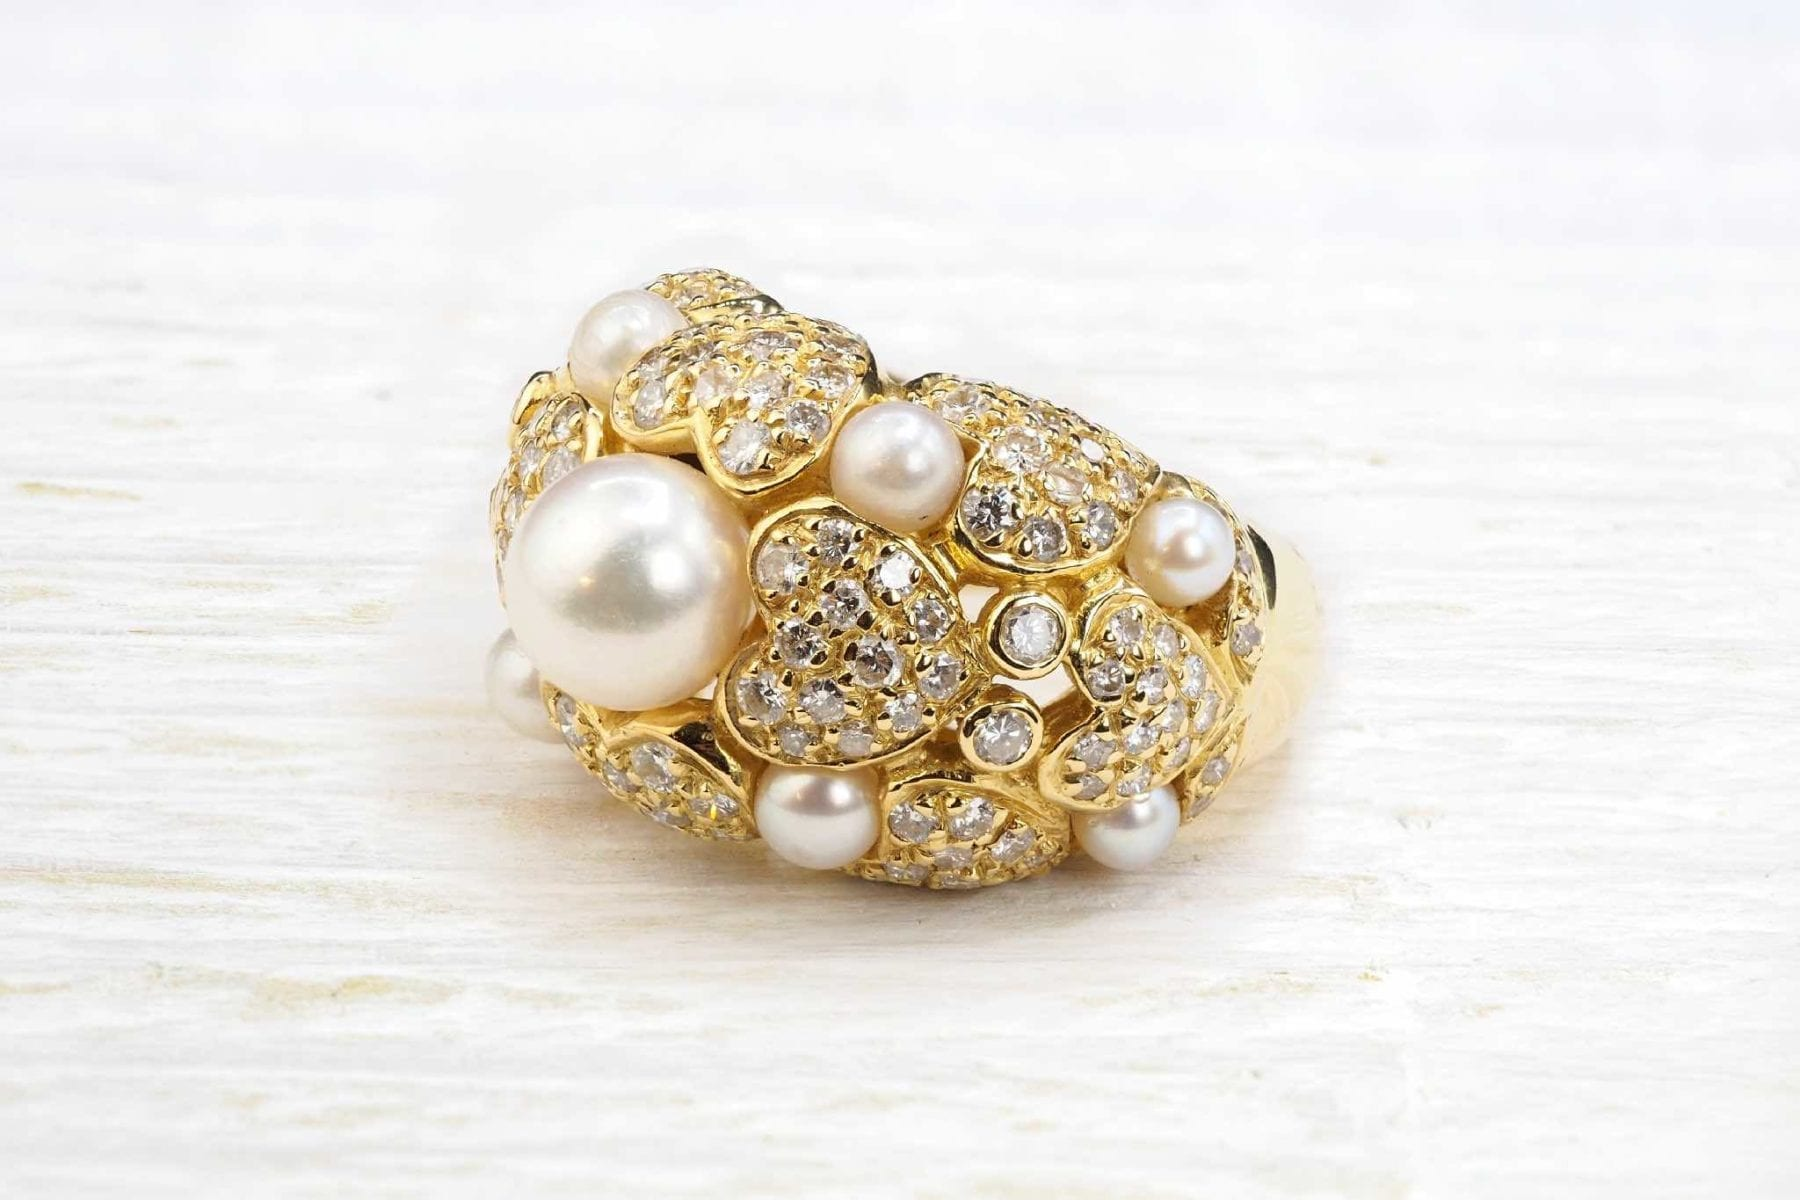 bagues style chanel diamants perles